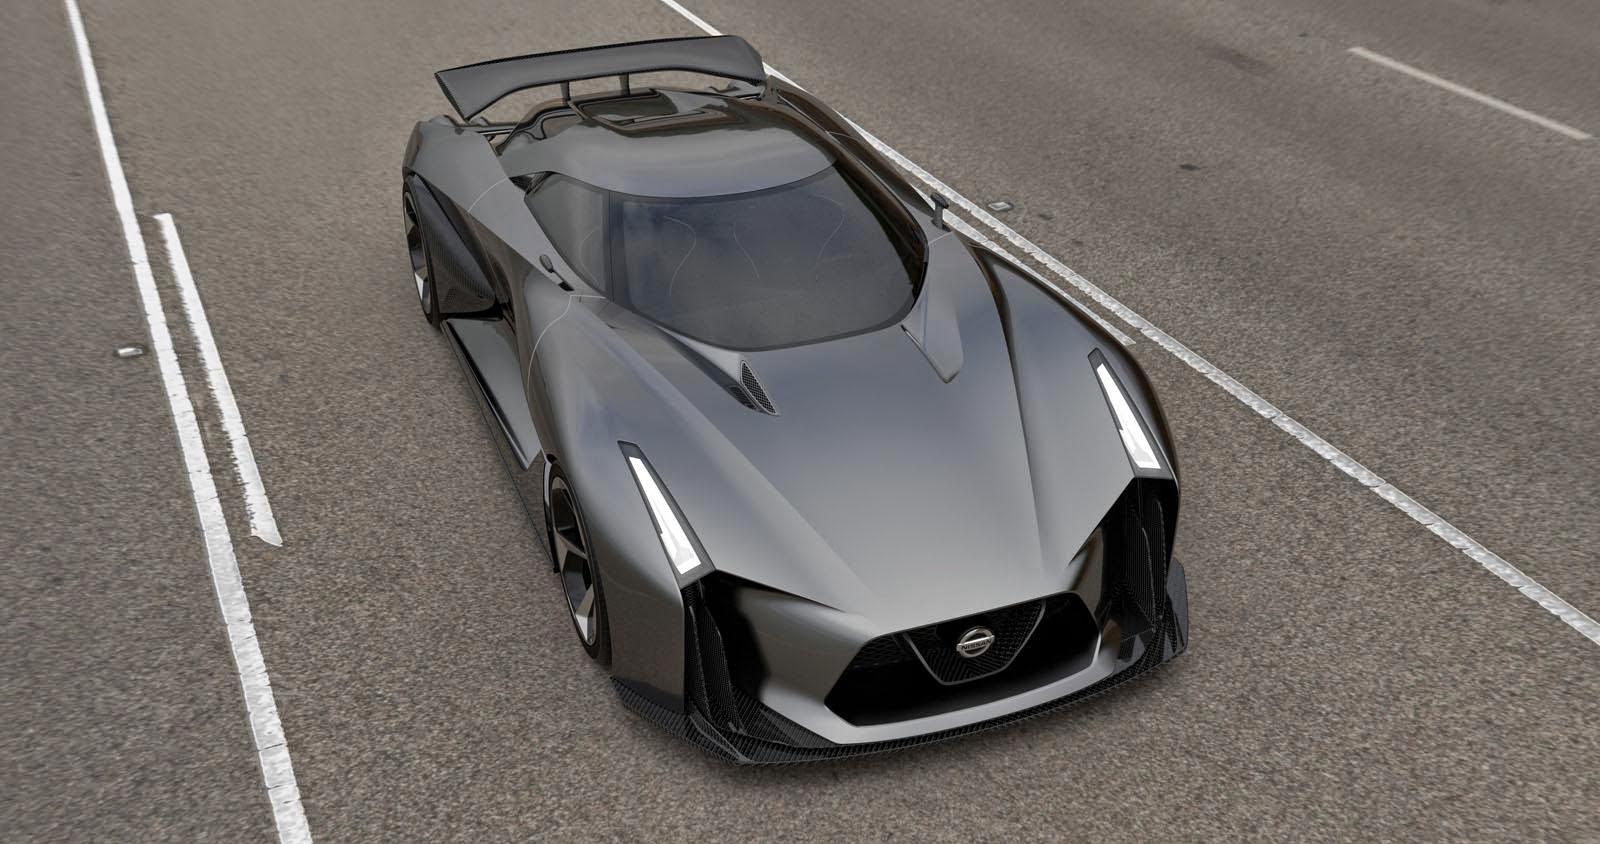 [Resim: Nissan+Concept+2020+Vision+Gran+Turismo+1.jpg]